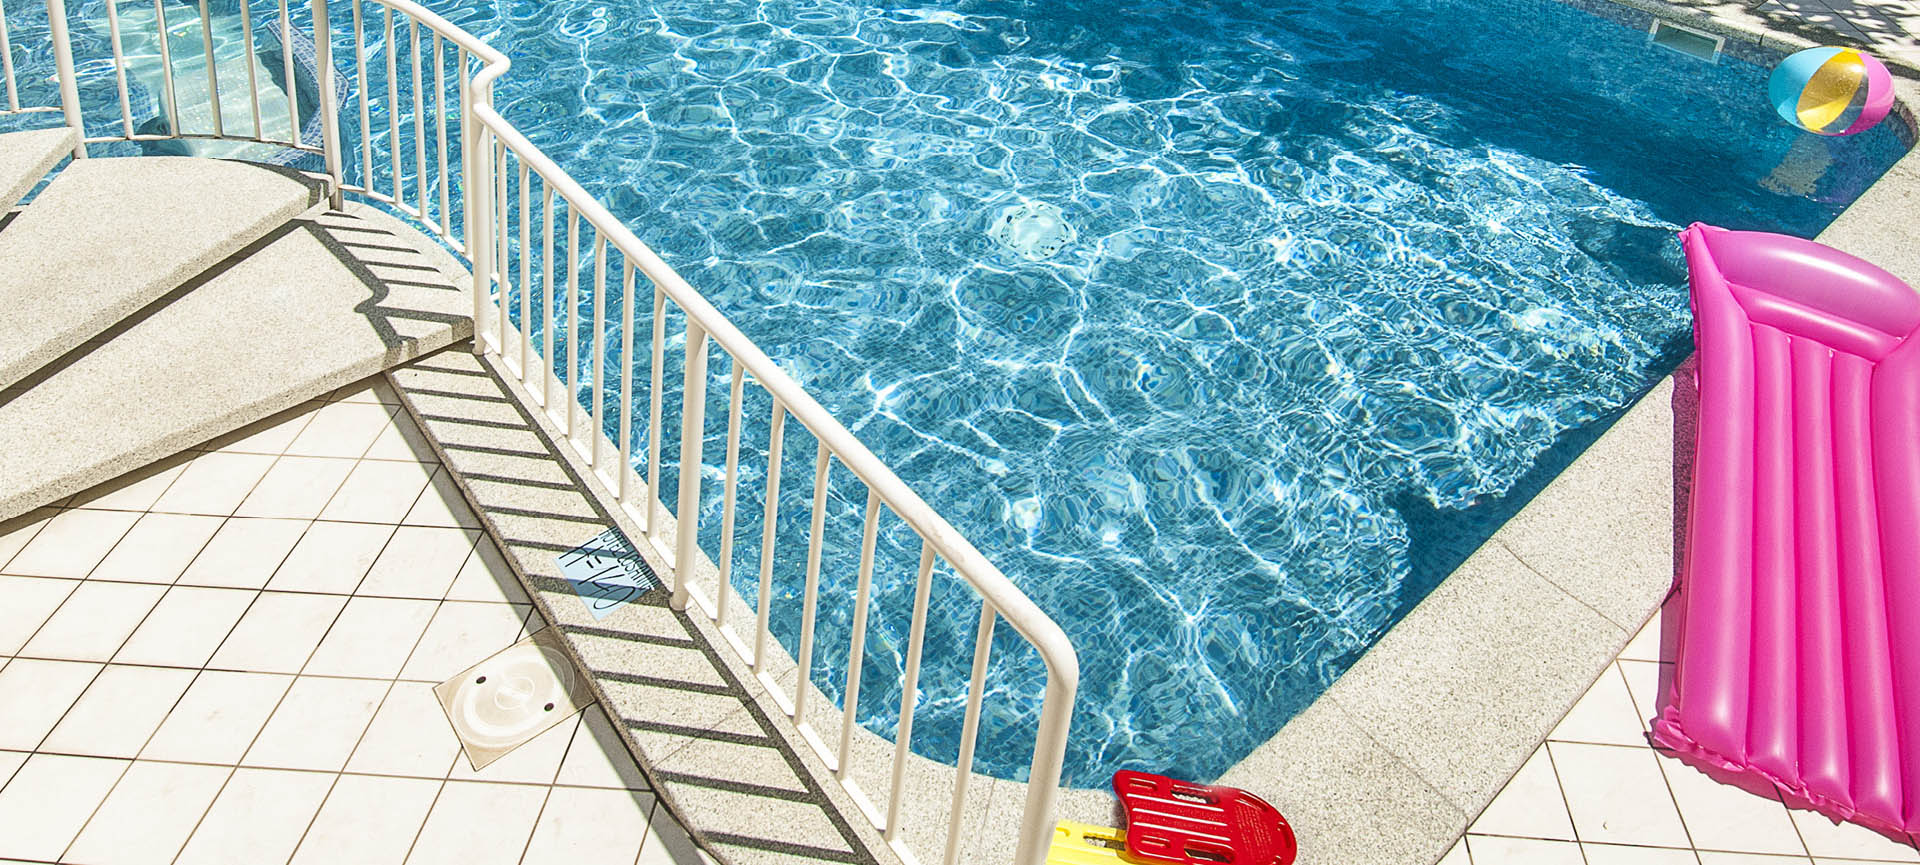 H tel avec piscine gabicce mare for Piscine hotel explorer